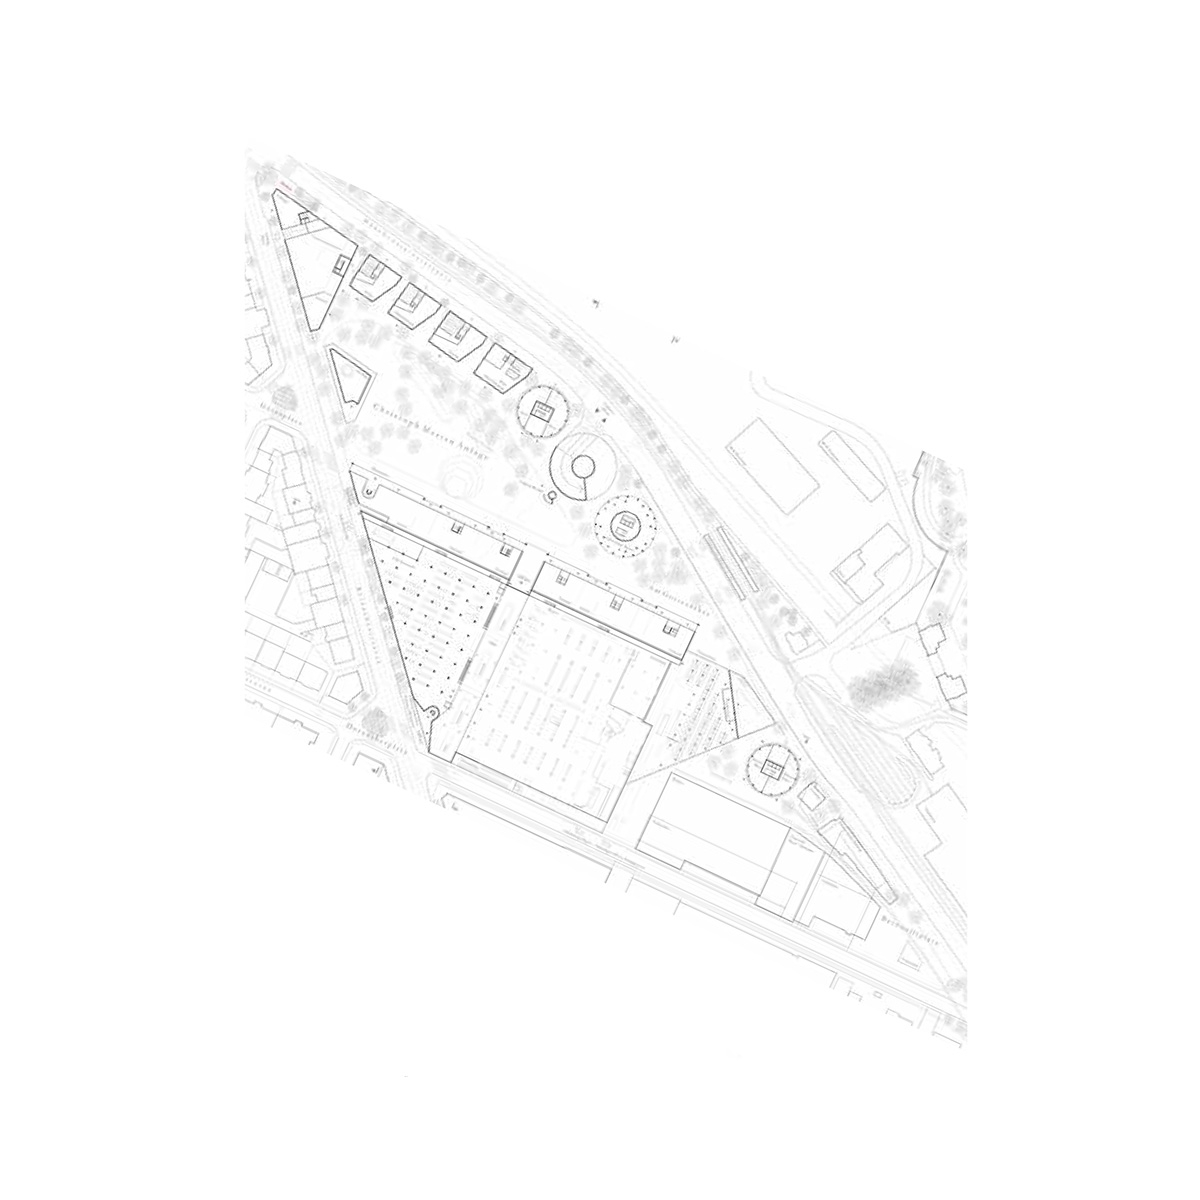 Herzog-de-Meuron-.-Nordspitze-new-master-plan-.-Basel-7.jpg